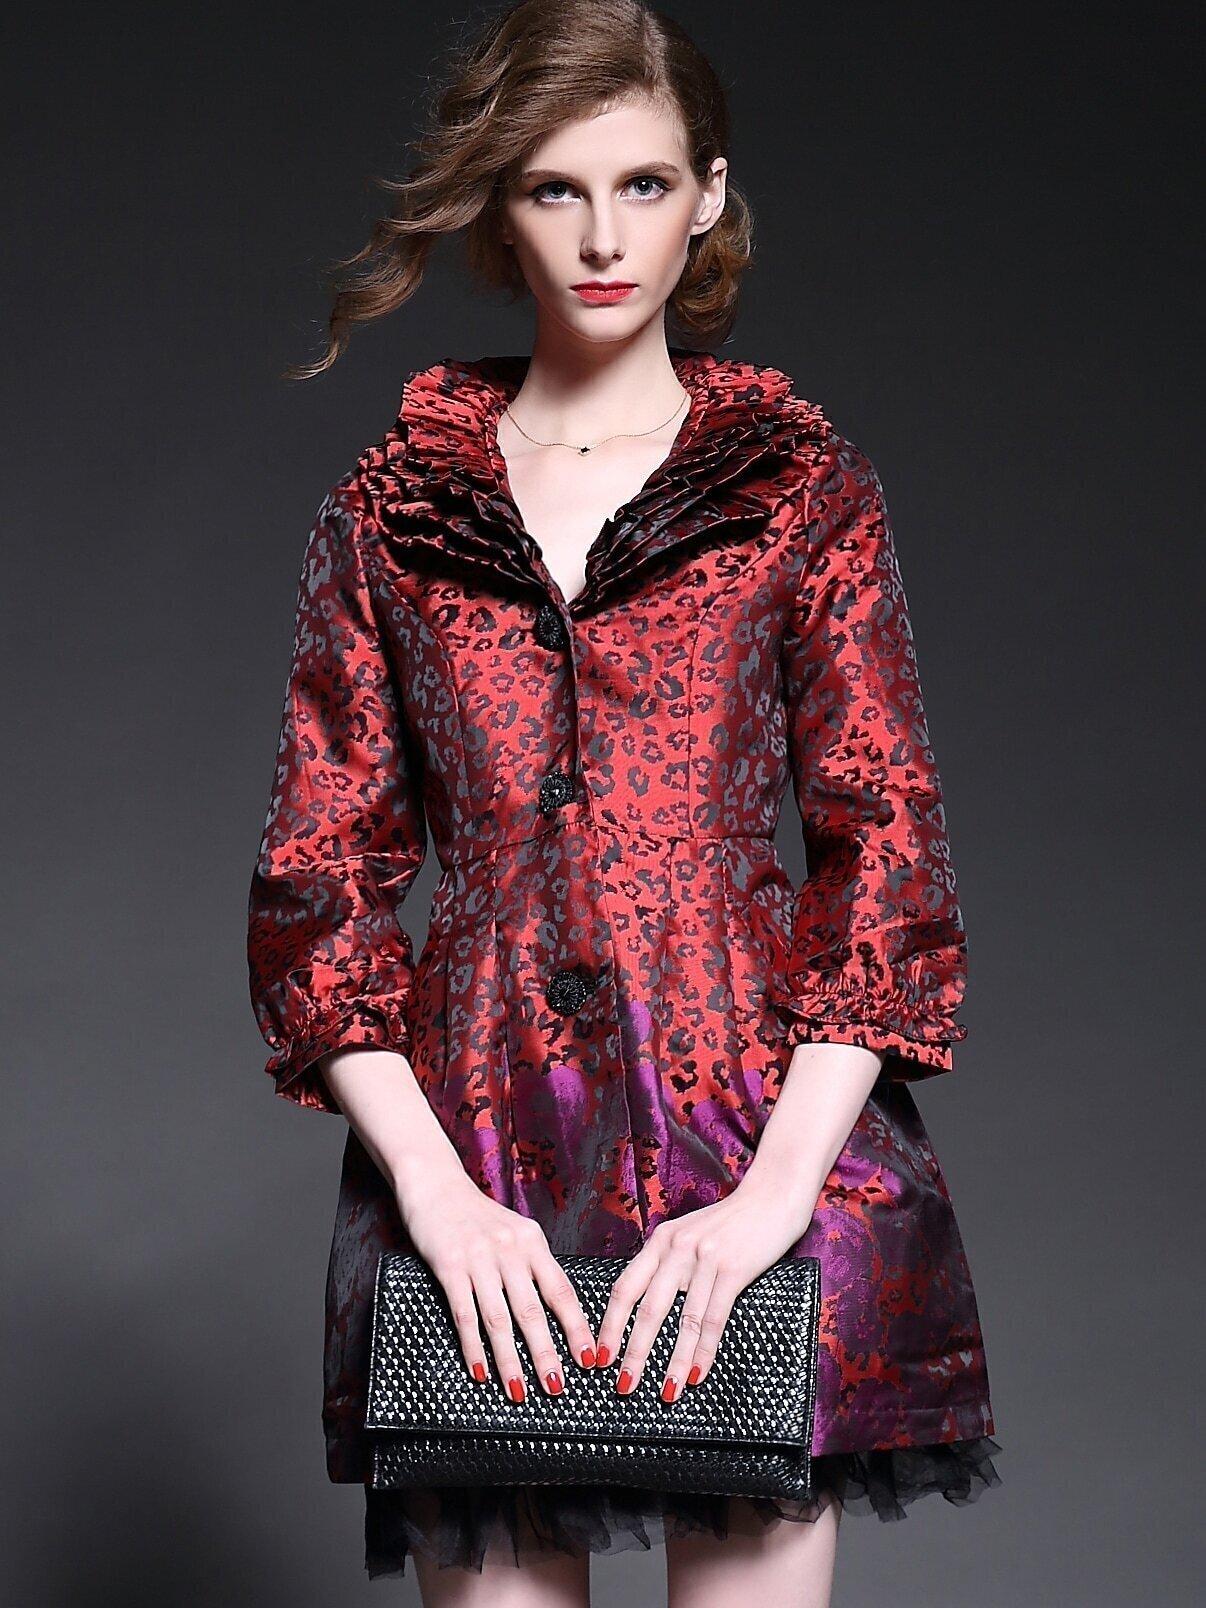 Red V Neck Length Sleeve Contrast Gauze Pockets Print Coat